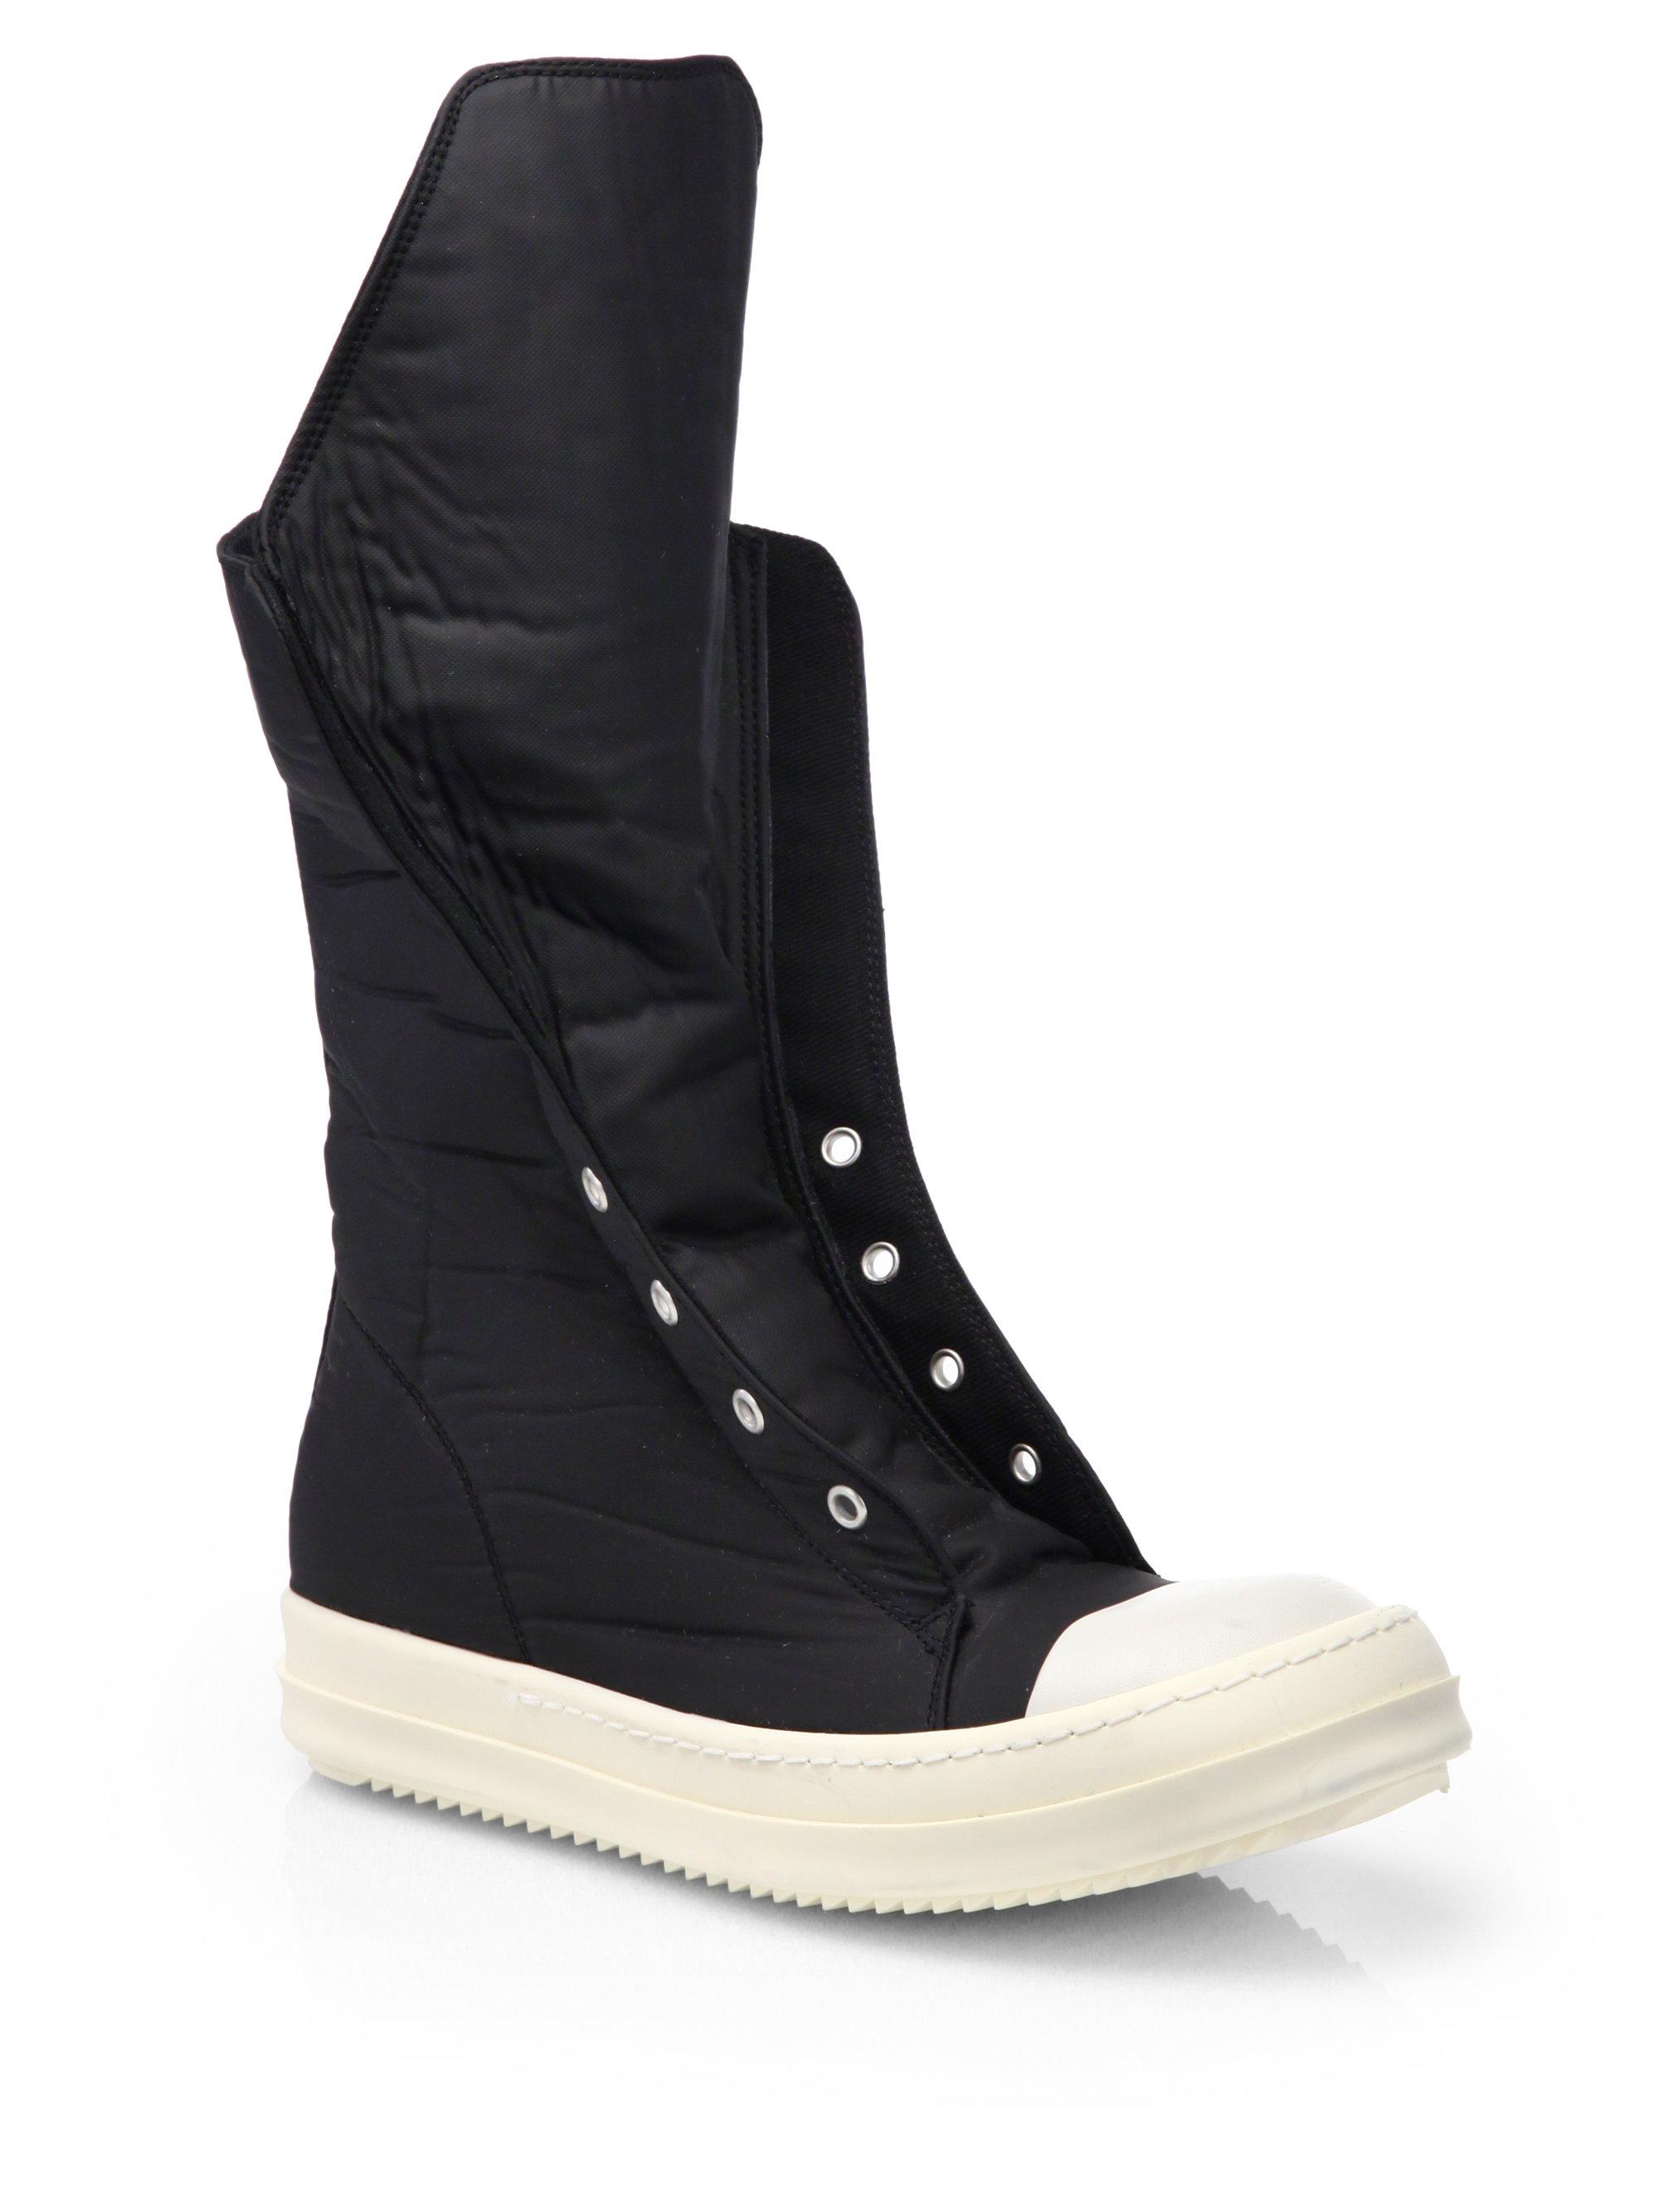 drkshdw by rick owens ramones hightop sneaker boots in black lyst. Black Bedroom Furniture Sets. Home Design Ideas